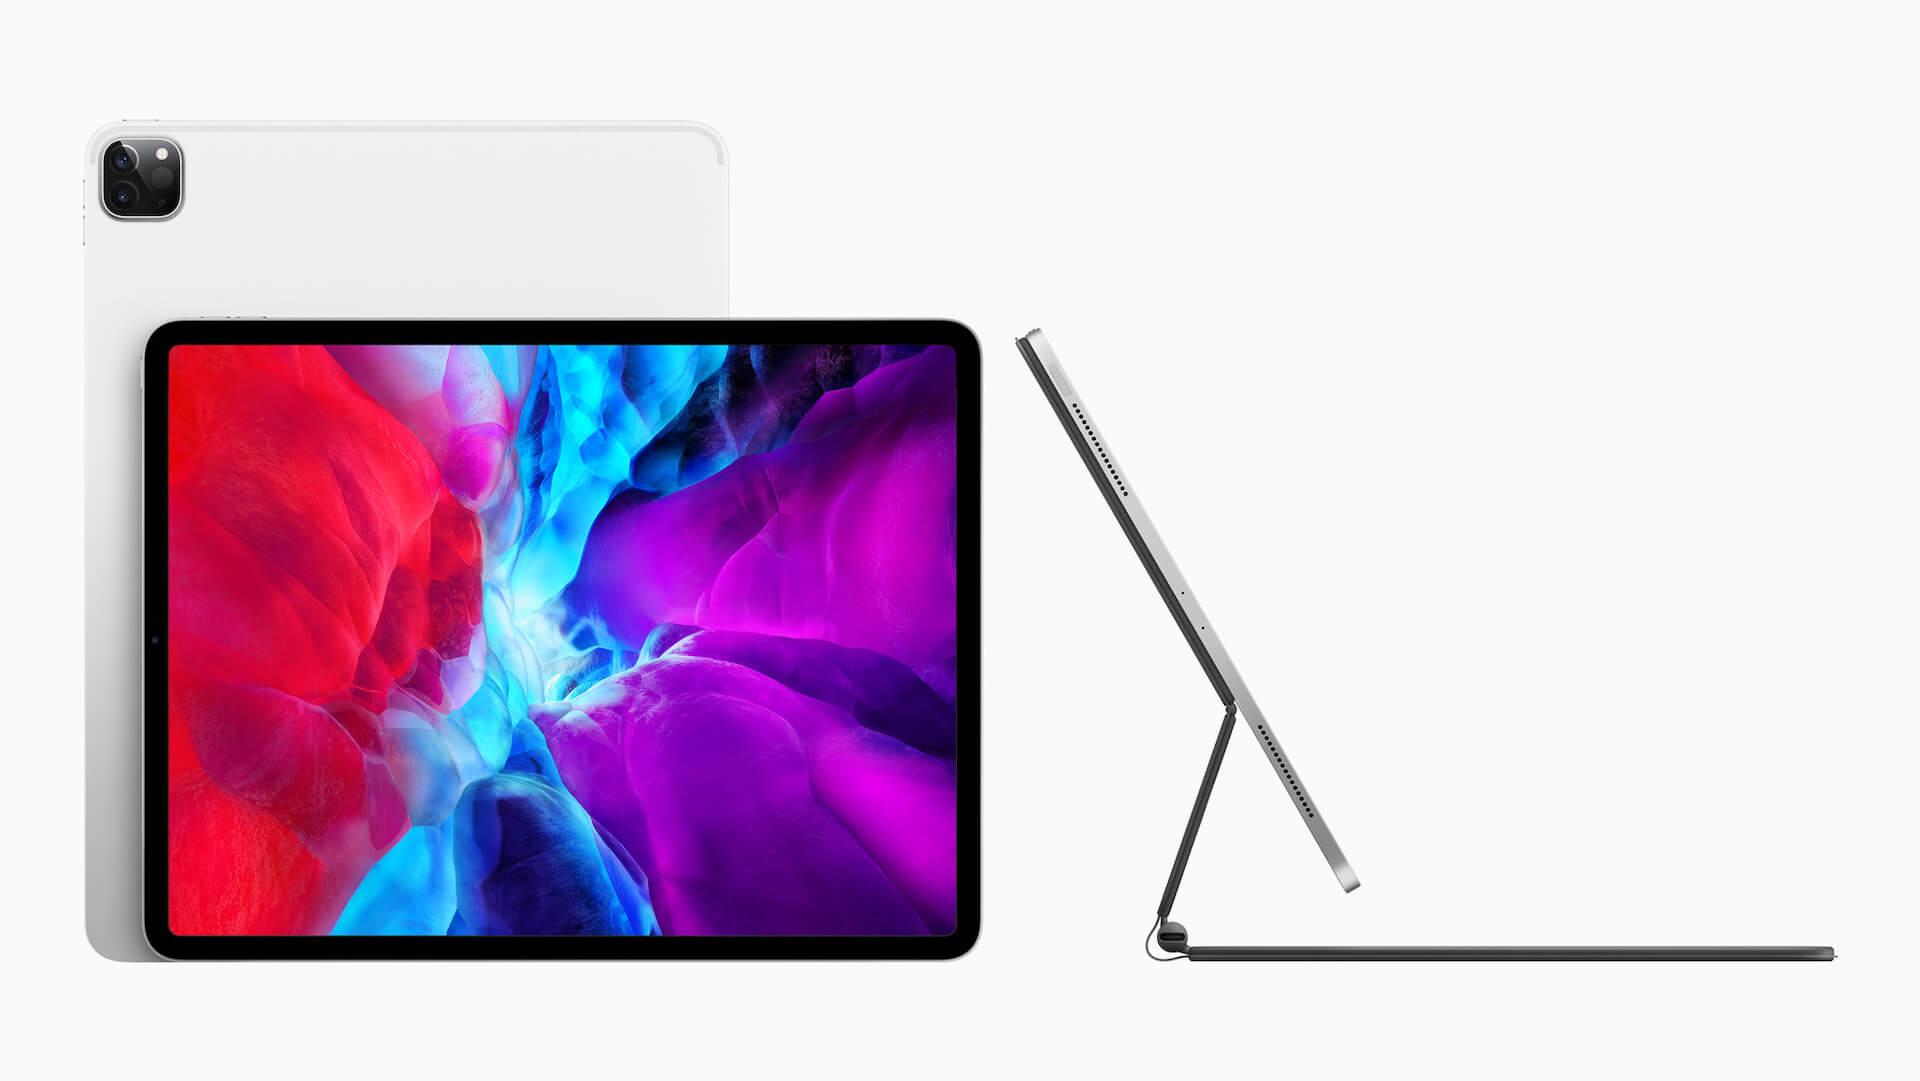 Apple、突如新型のMacBook AirとiPad Proを発表!iPad Proはデュアルカメラ、MacBook Airはシザー式キーボードに tech200318_macbookair_ipadpro_1